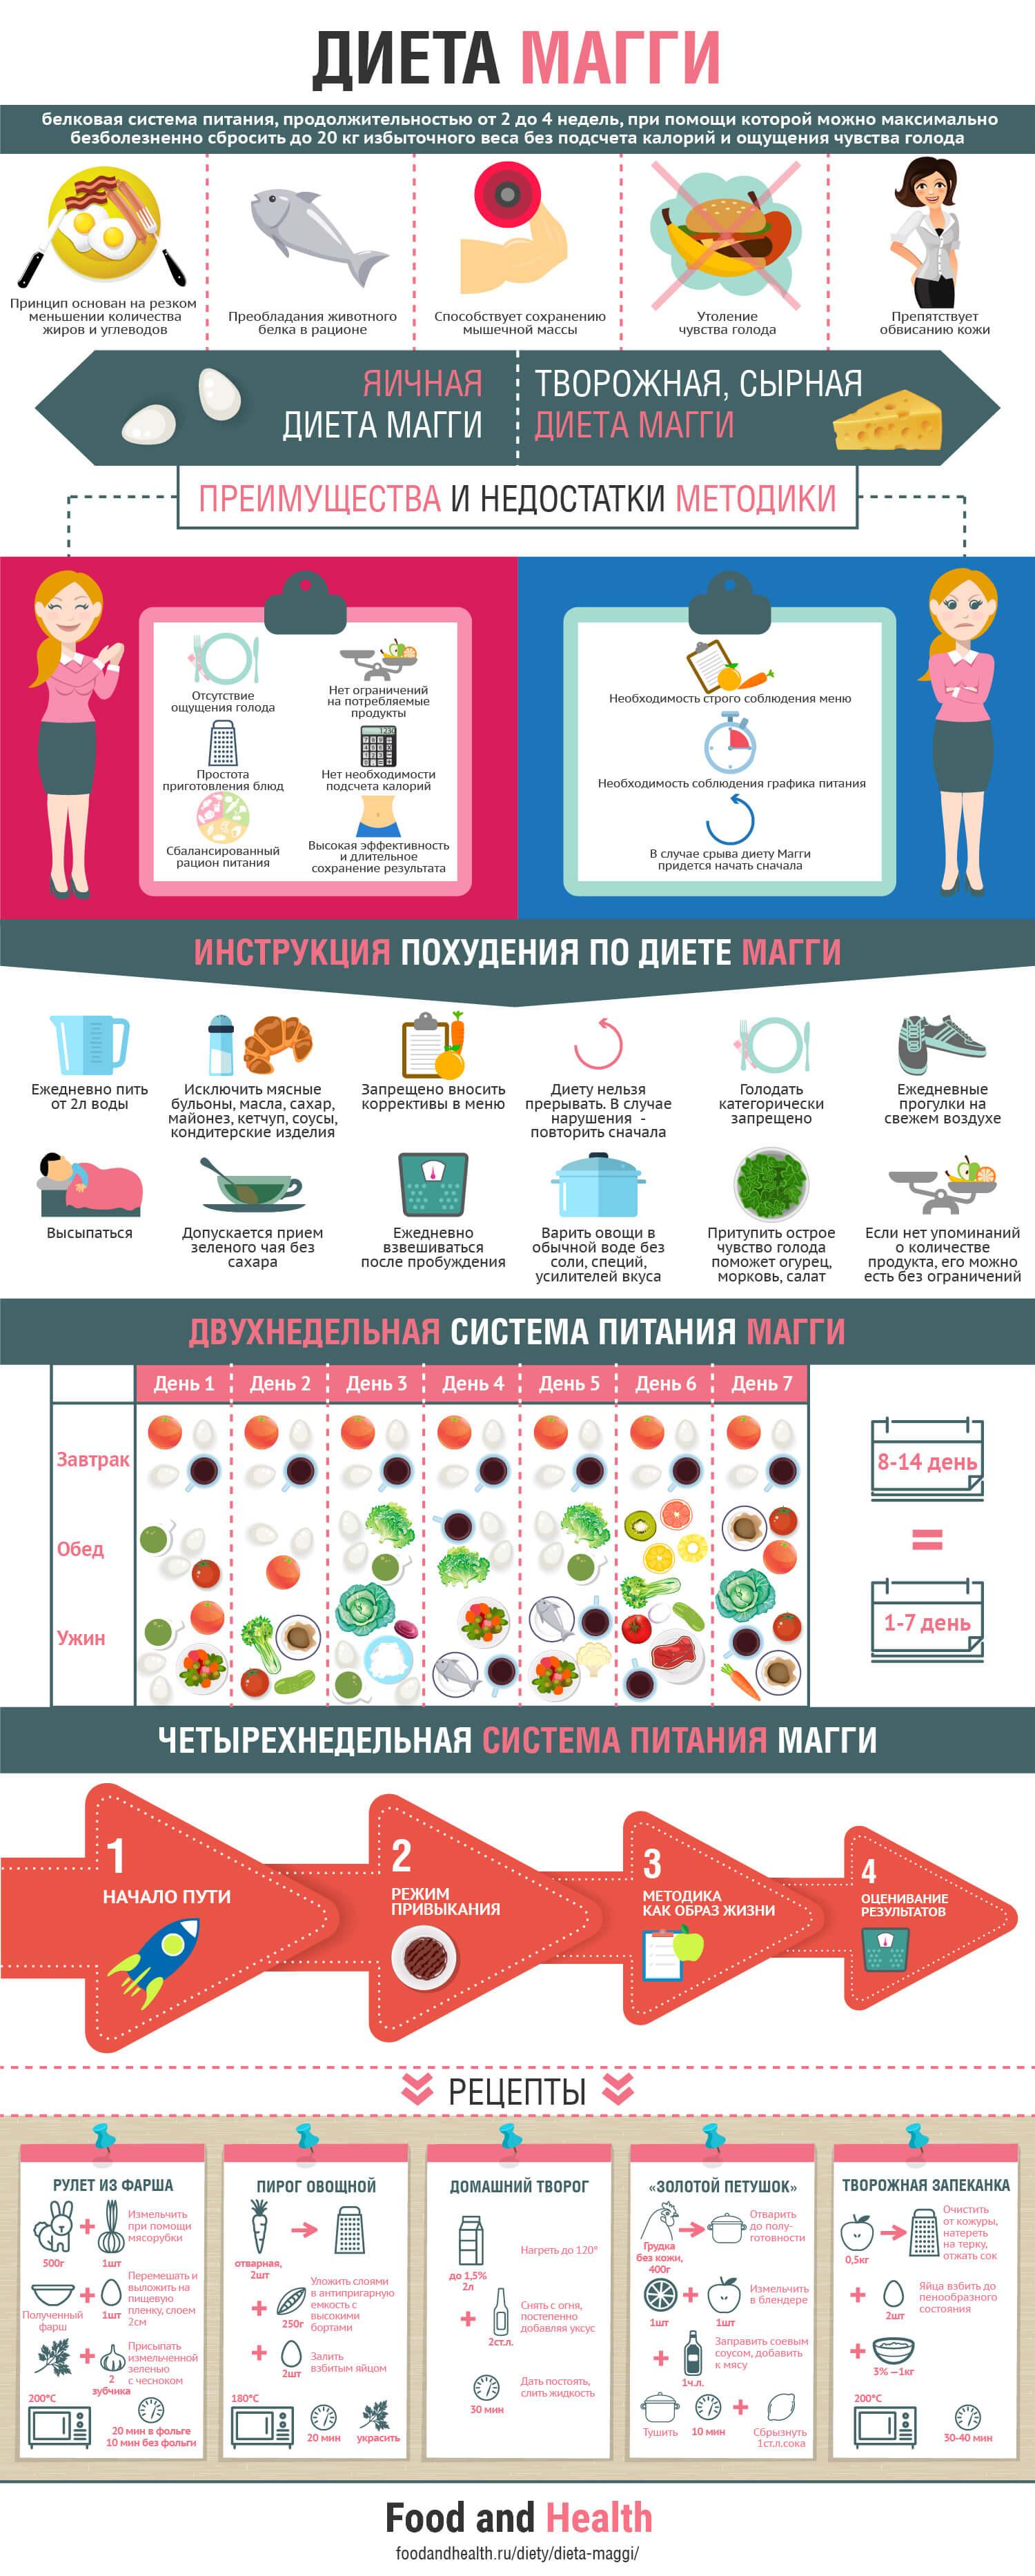 Диета Магги - инфографика